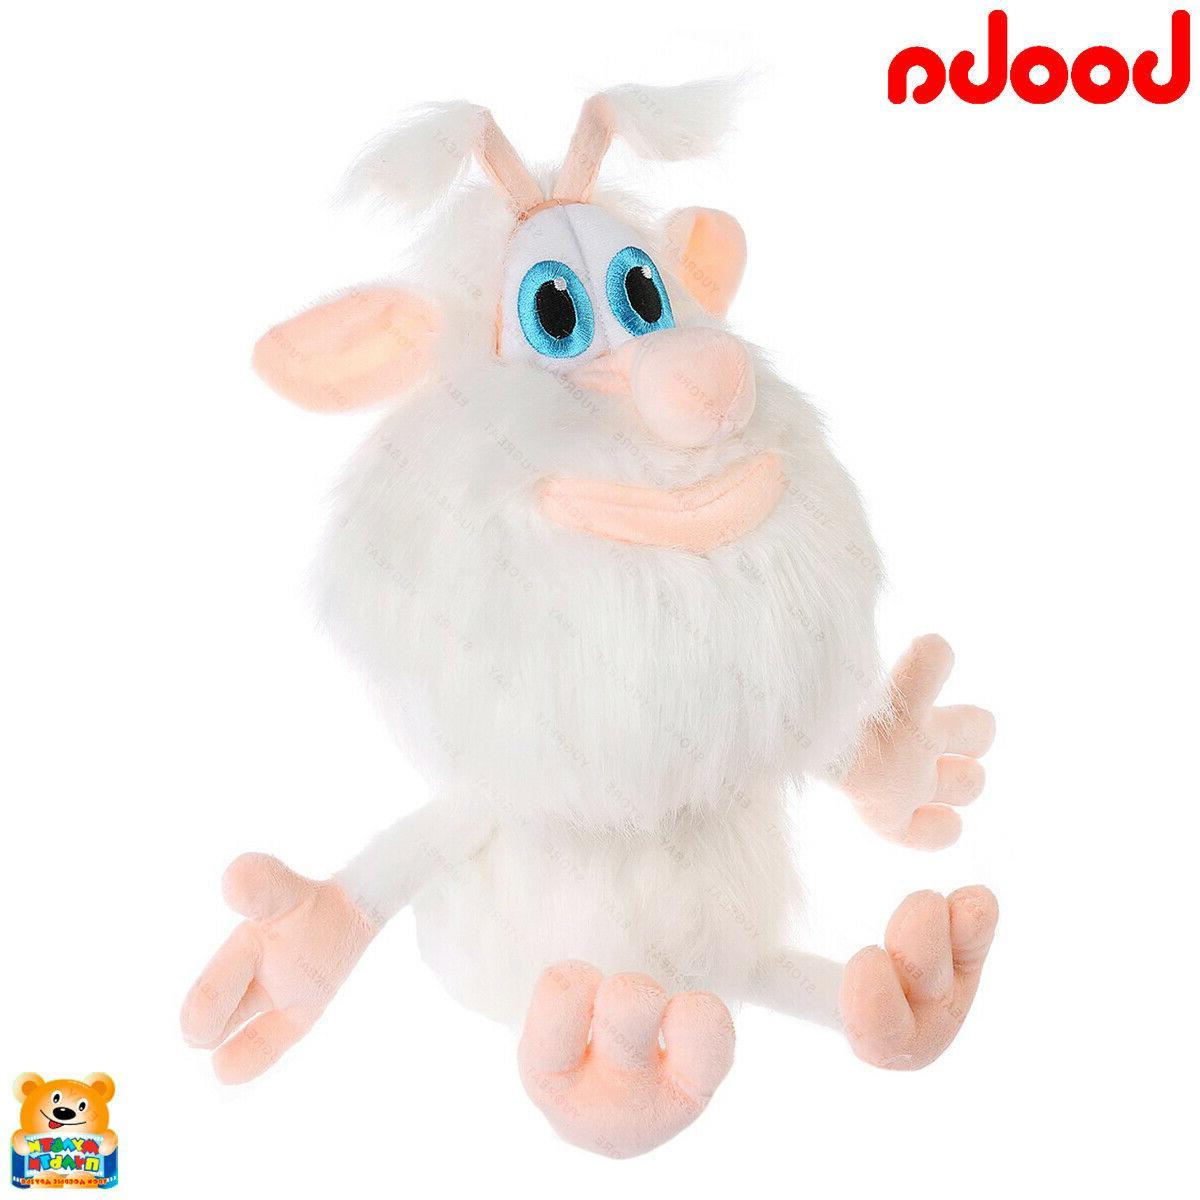 MULTI PULTI Booba, Buba, Talking Plush, Toy, Cartoon Character